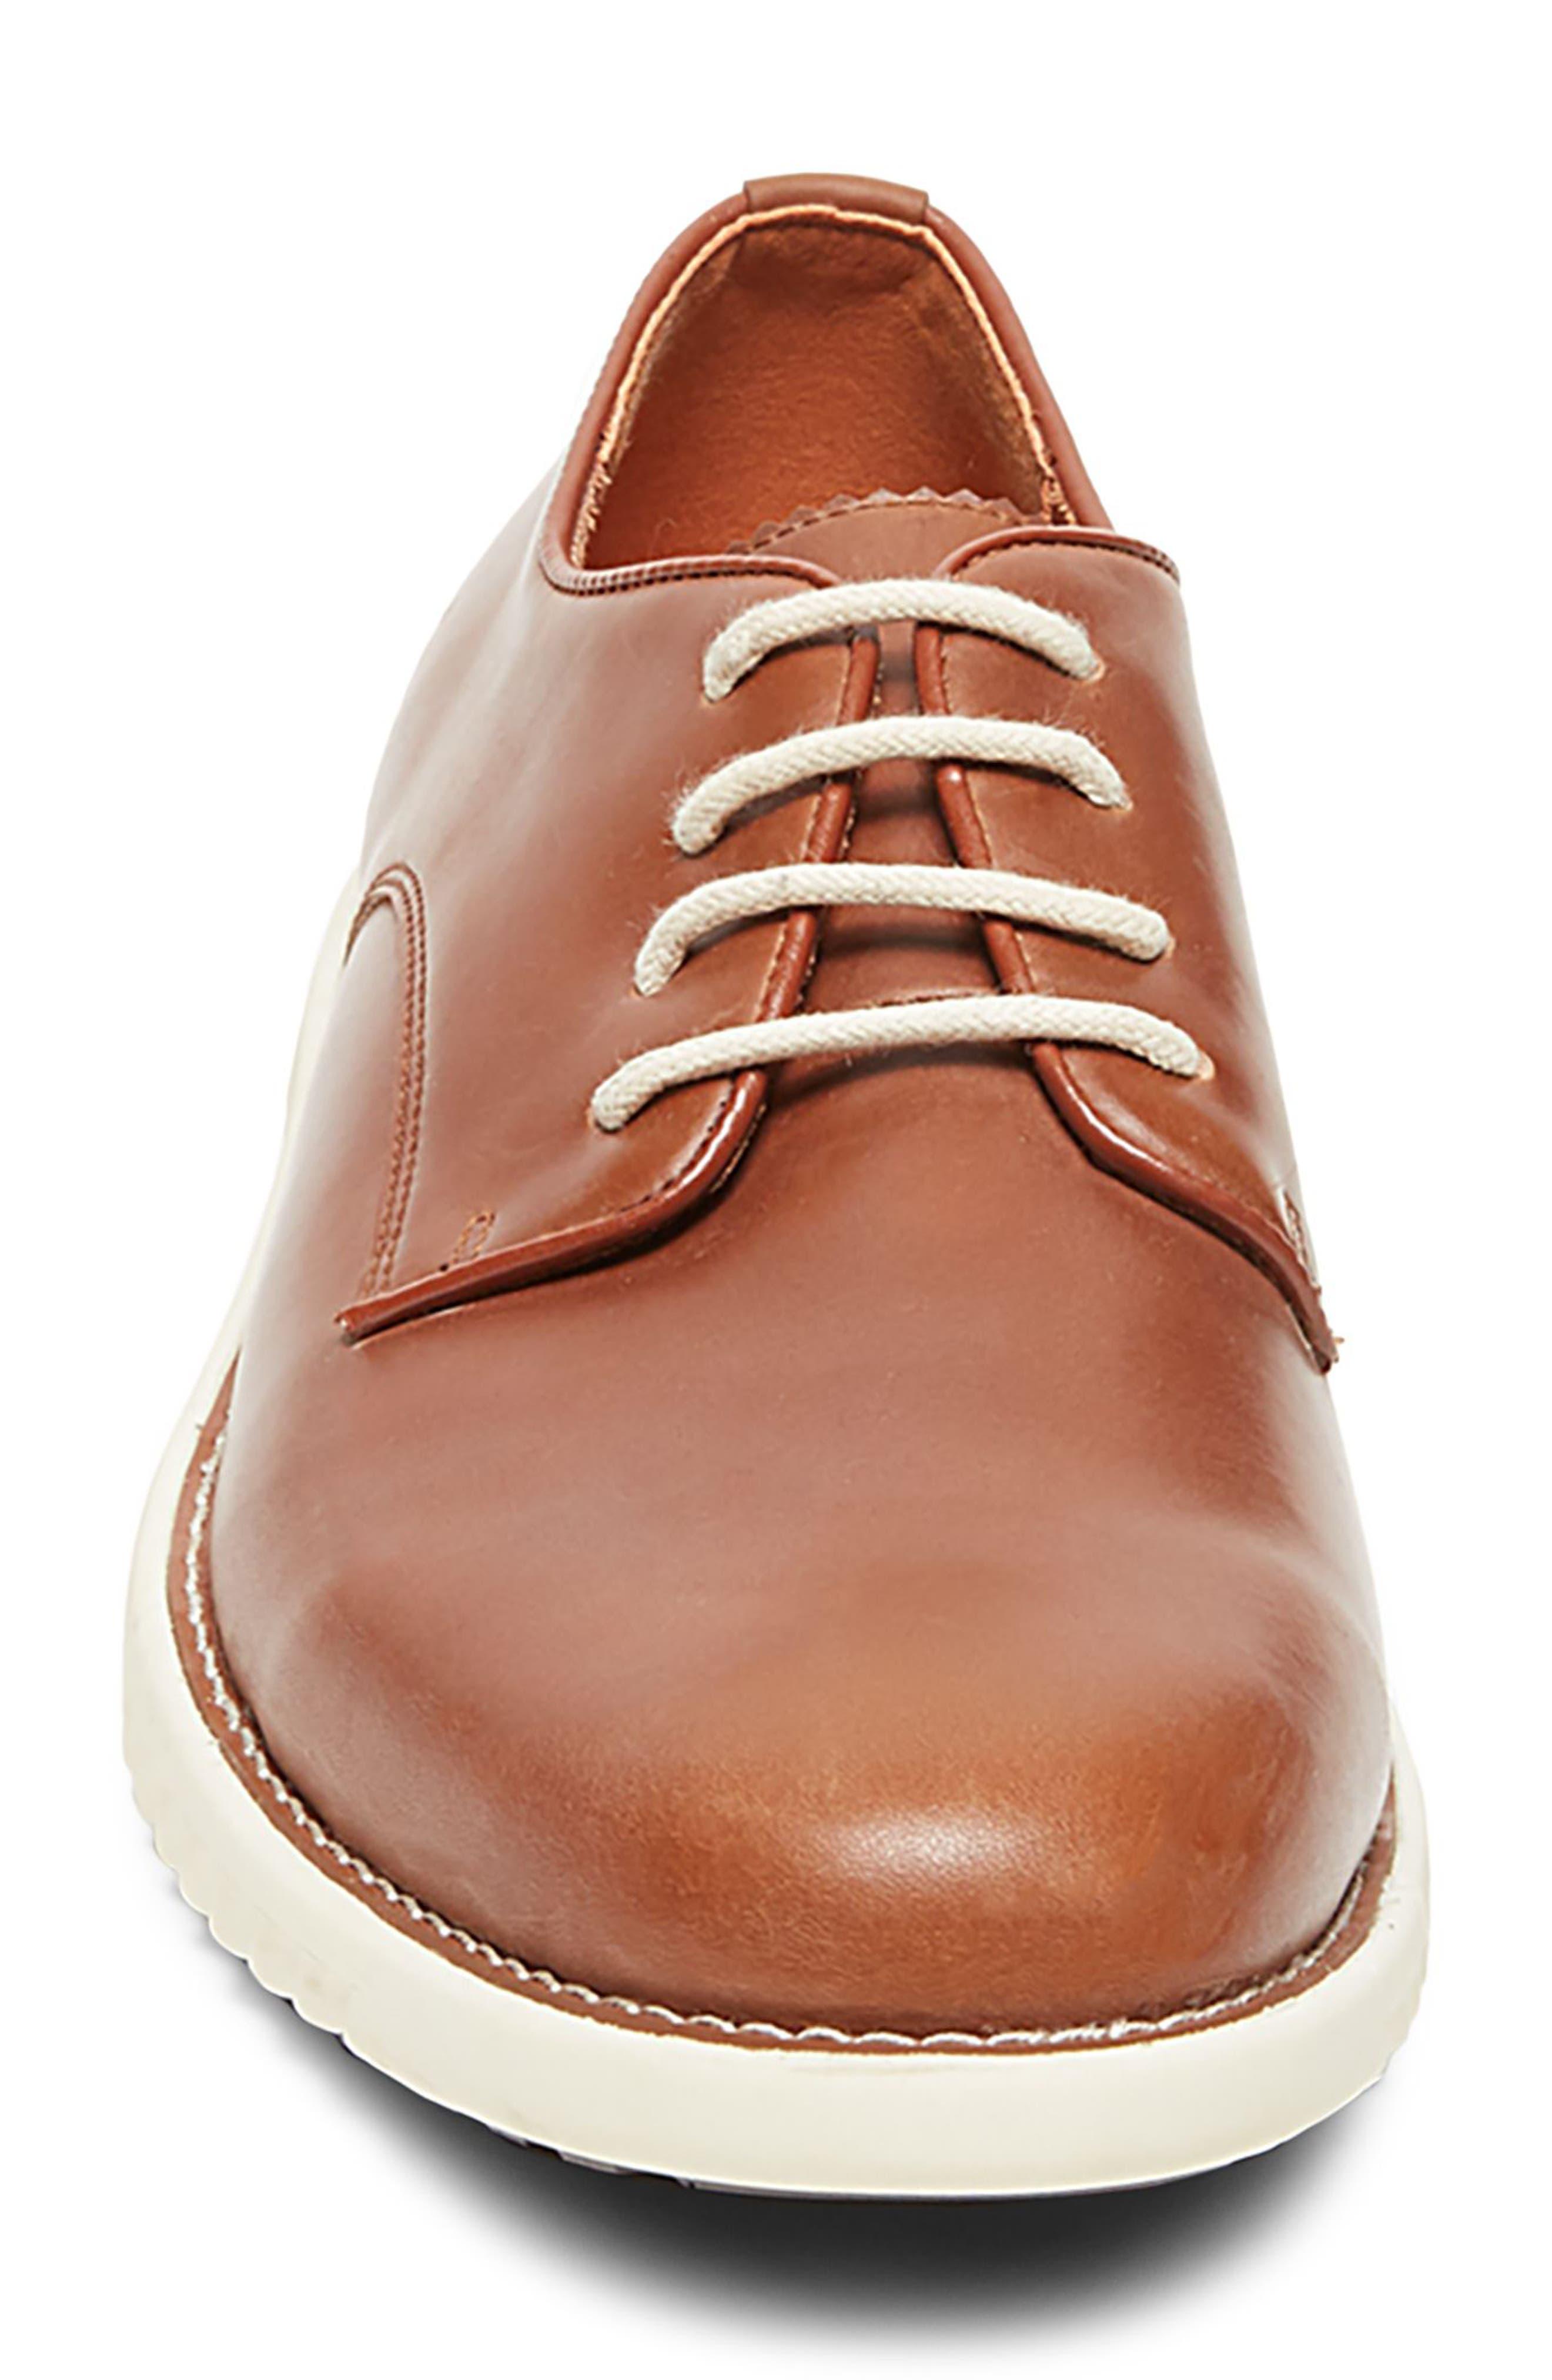 Vance Sneaker,                             Alternate thumbnail 4, color,                             Tan